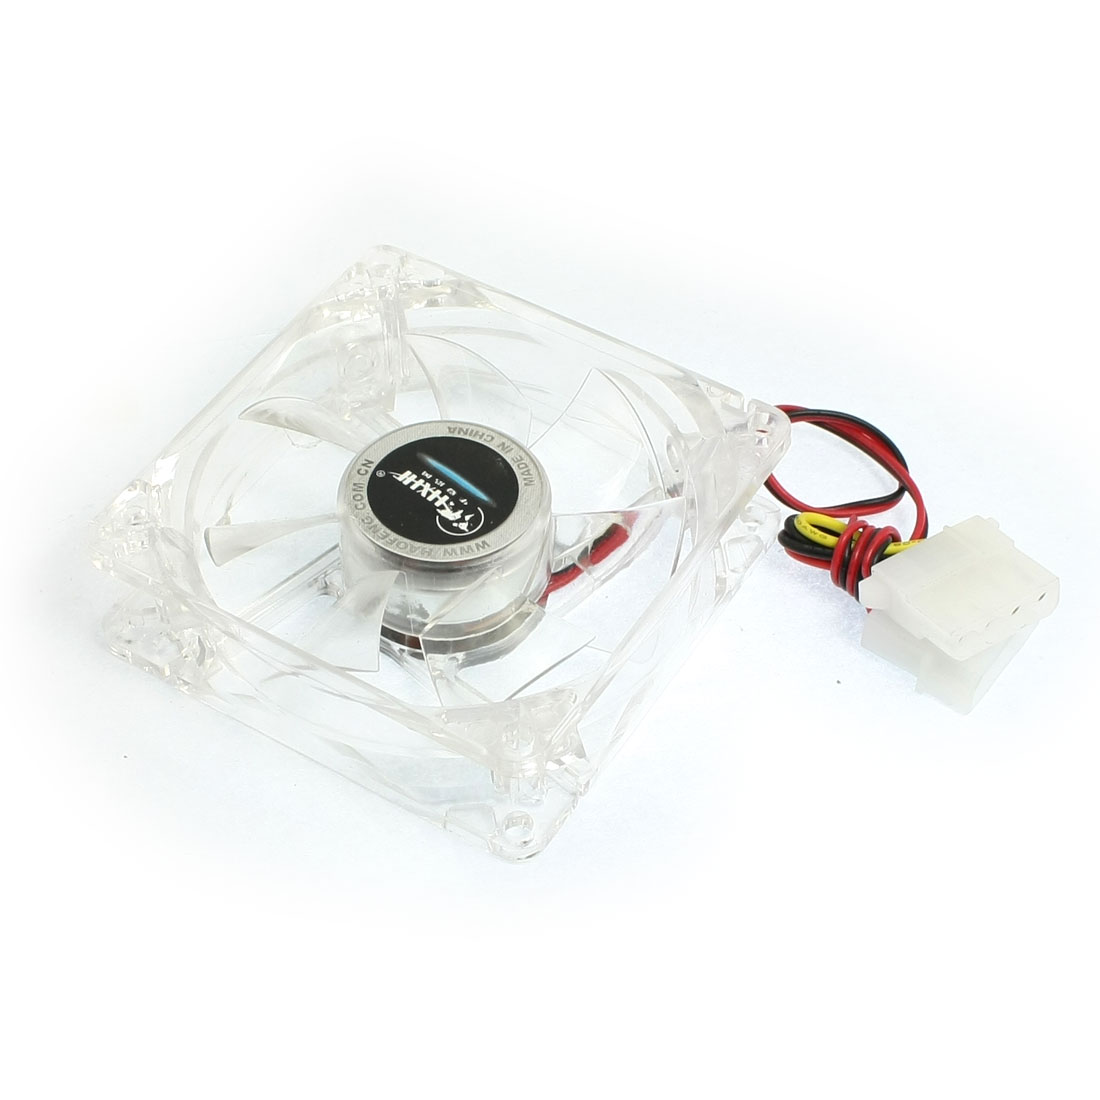 80mm x 80mm x 25mm Case Fan 12VDC 33.05CFM Cooling Fan Cooler Clear White